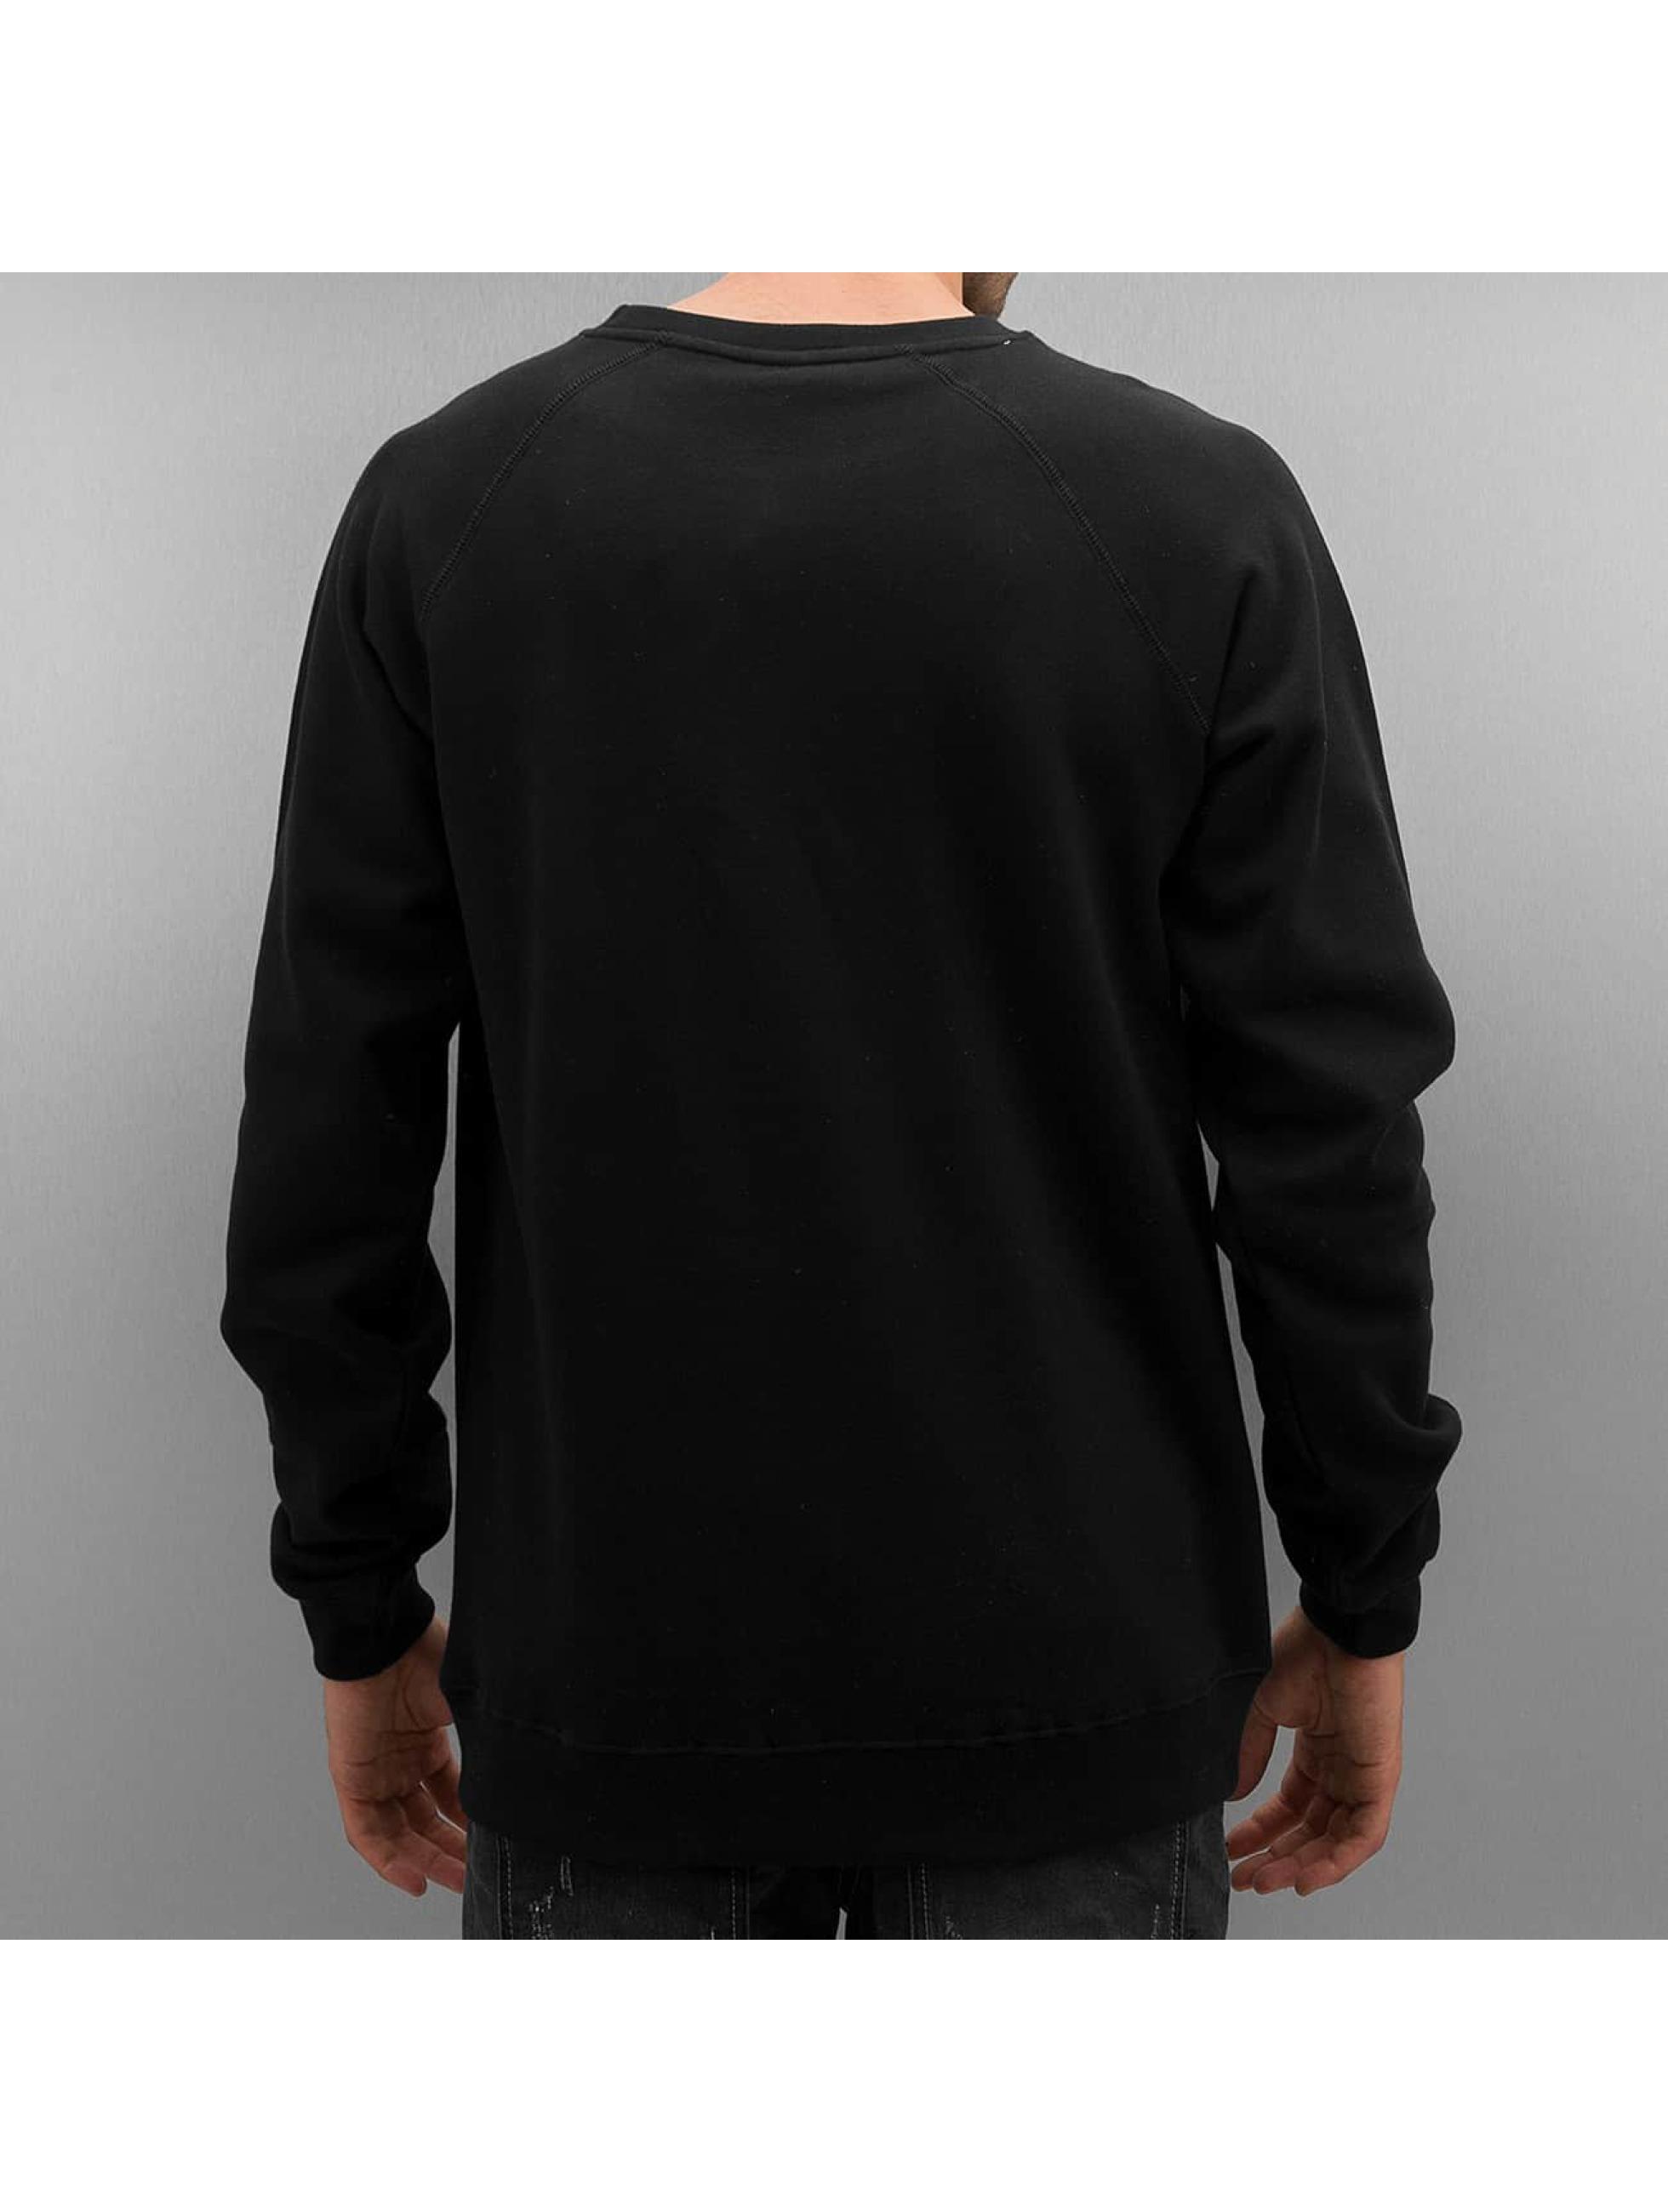 The Dudes Пуловер High черный